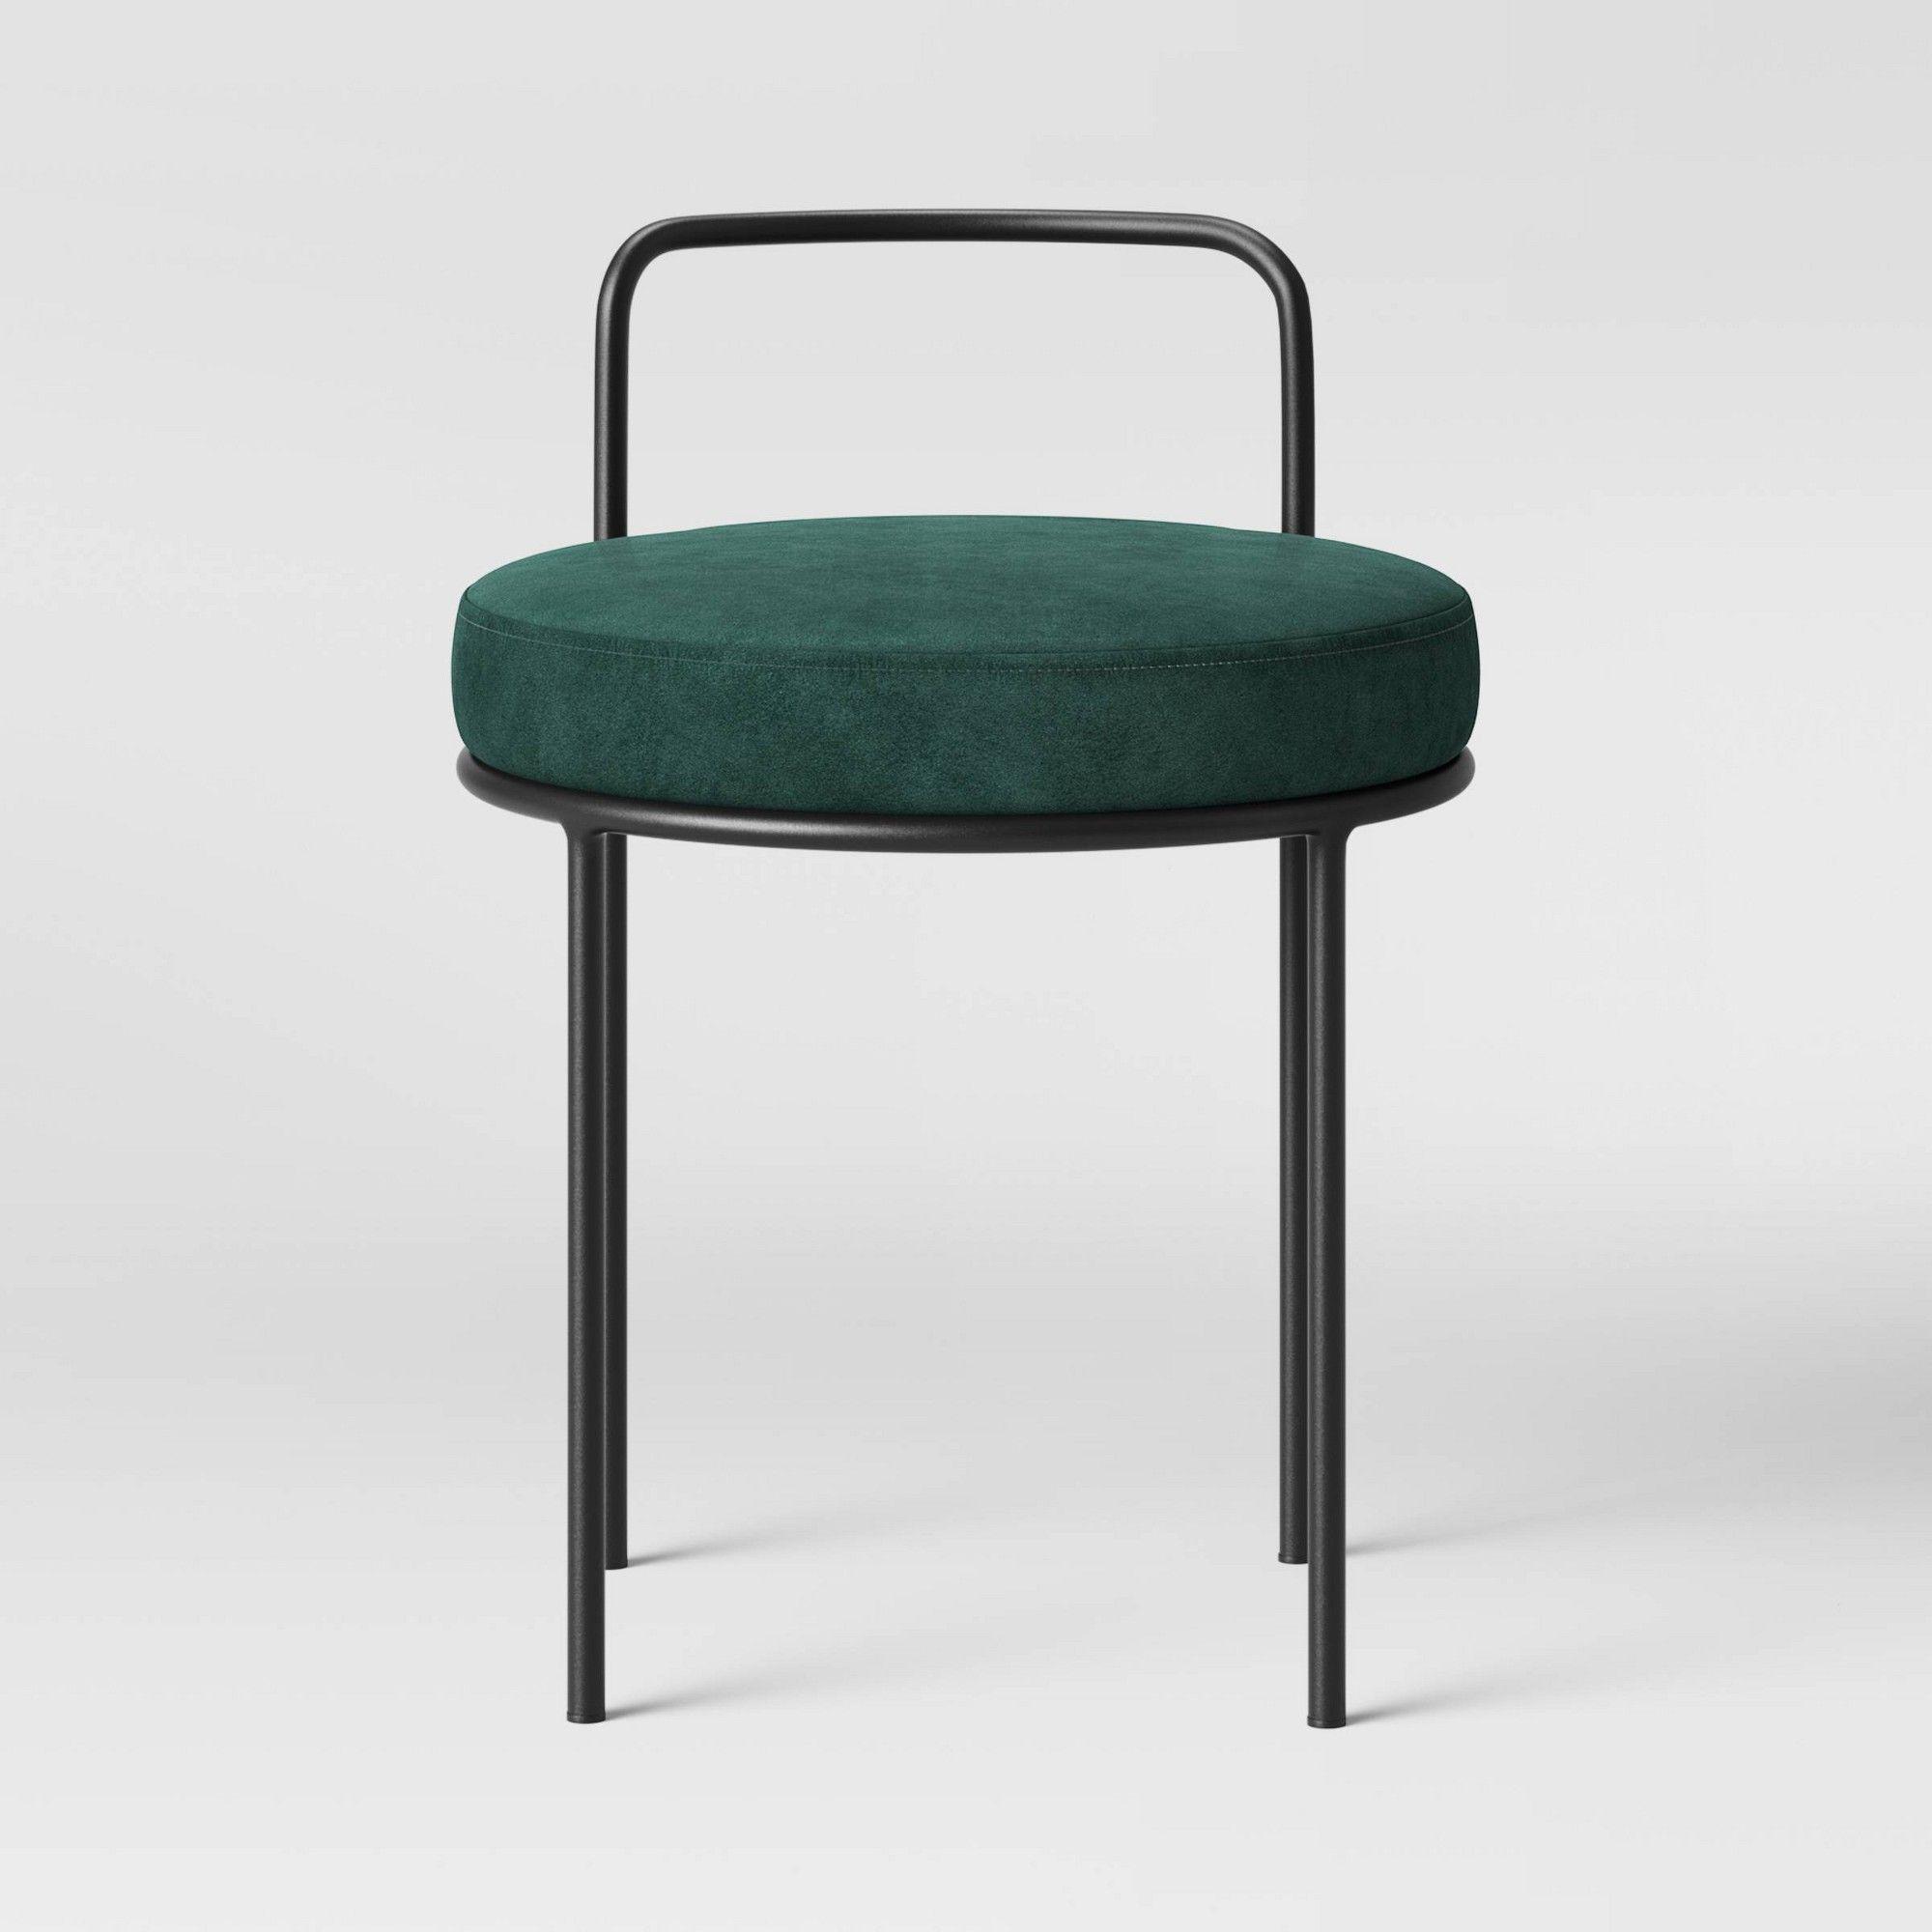 Terrific Velvet Accent Stool With Matte Black Handle Dark Green Machost Co Dining Chair Design Ideas Machostcouk